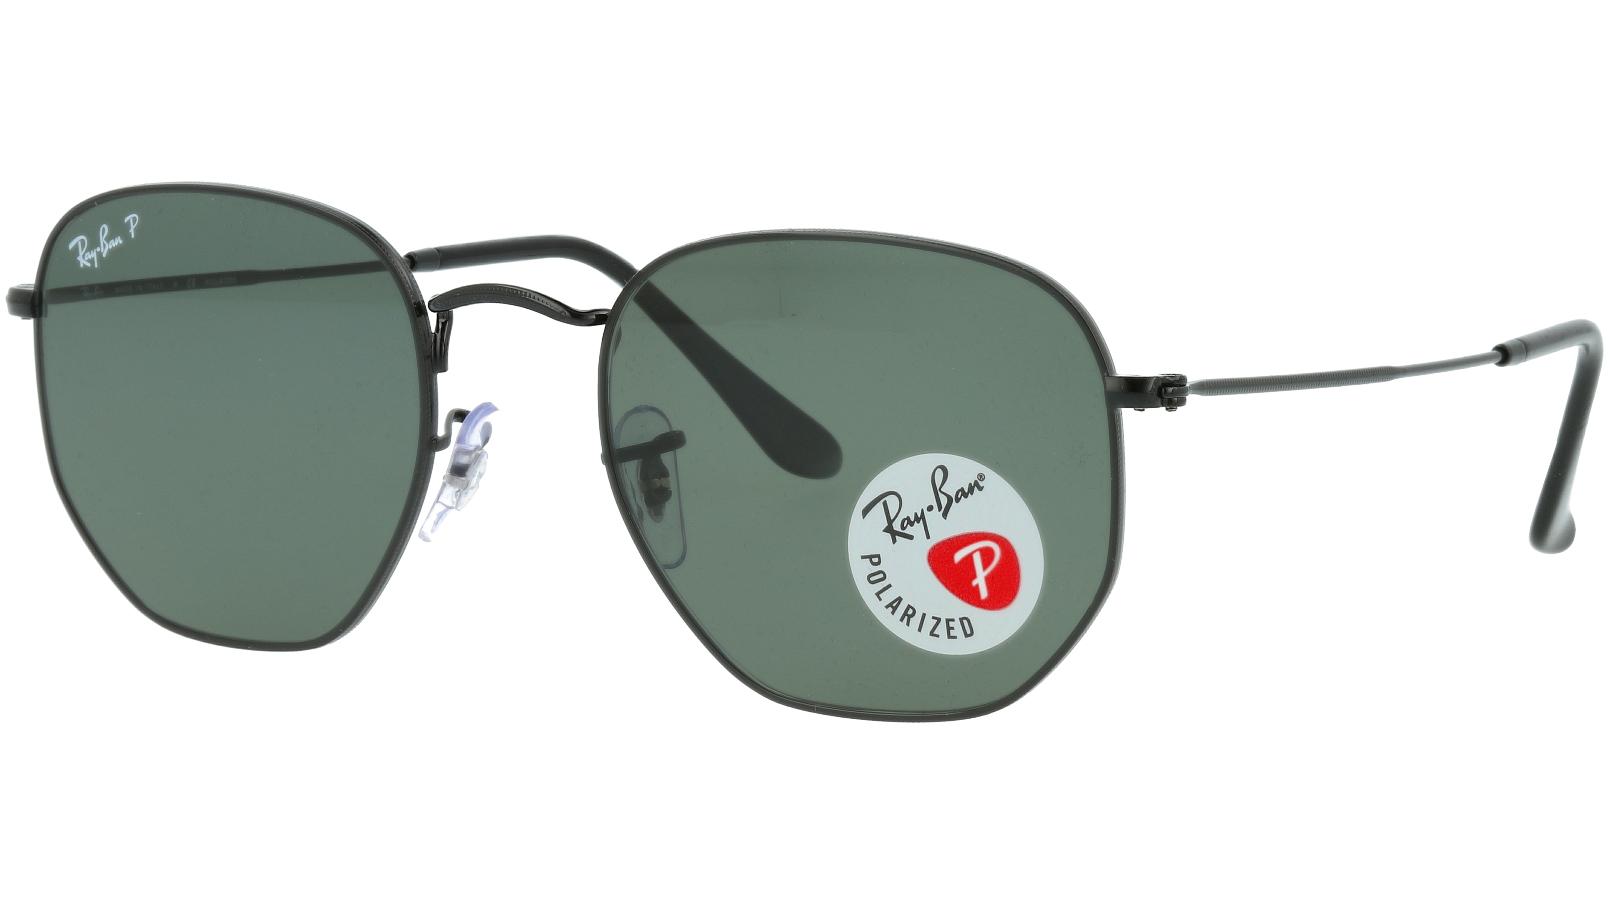 Ray-Ban RB3548N 002/58 Black Polarized Sunglasses